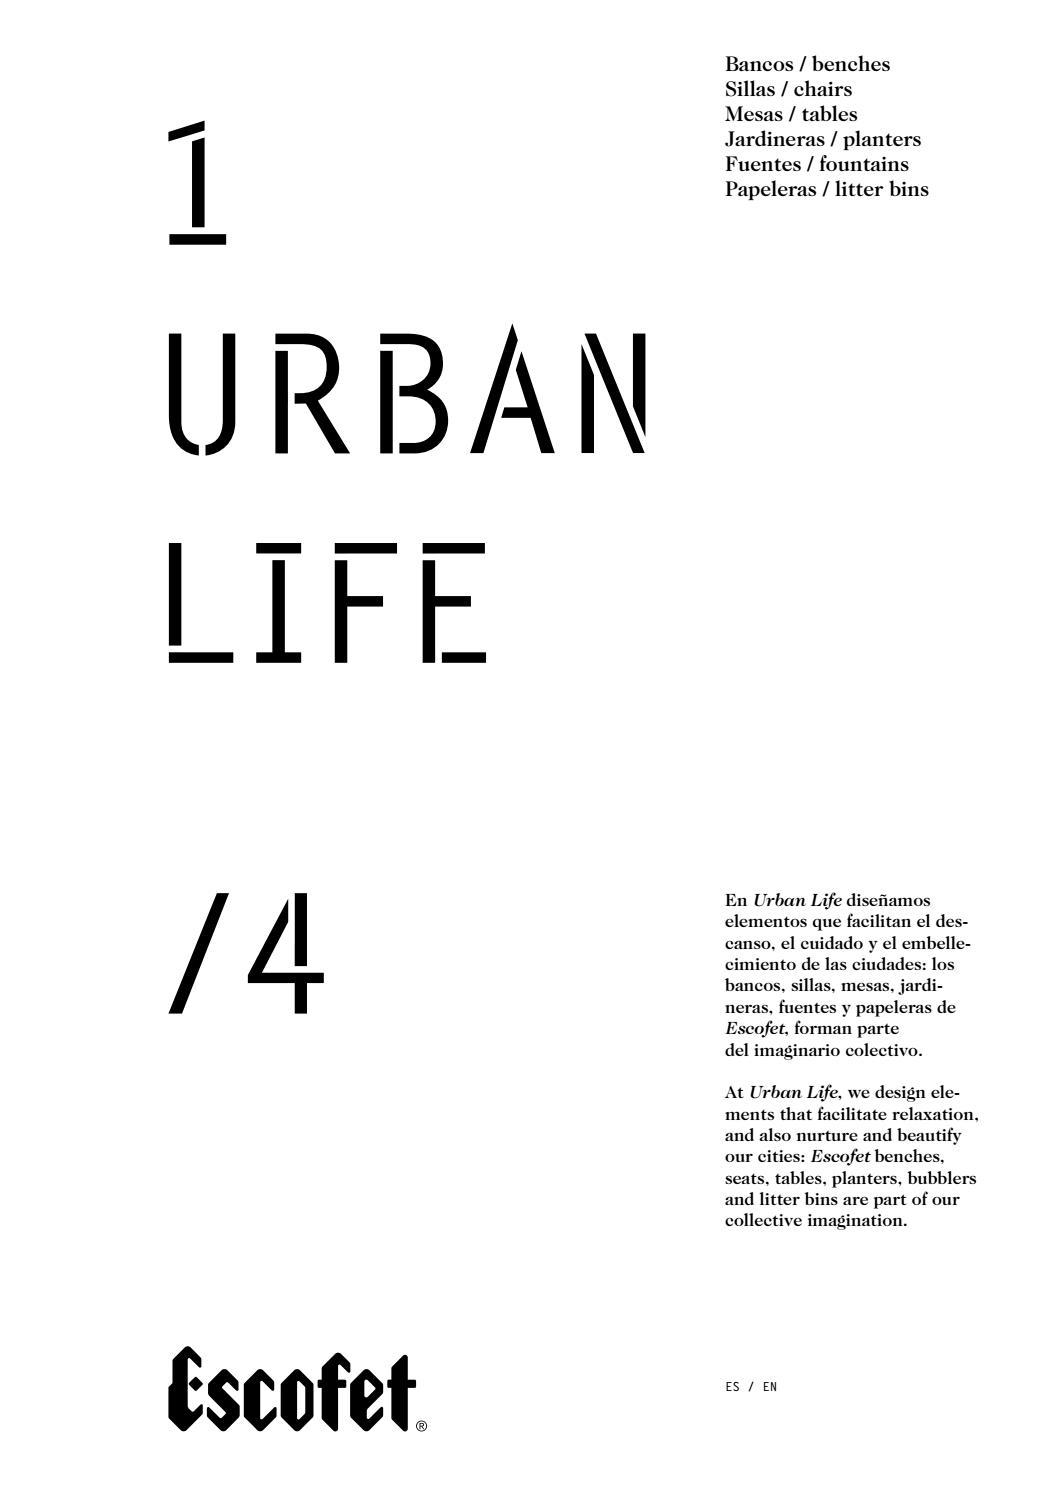 Escofet Urban Life catalogus by Samson Urban Elements B.V. - issuu